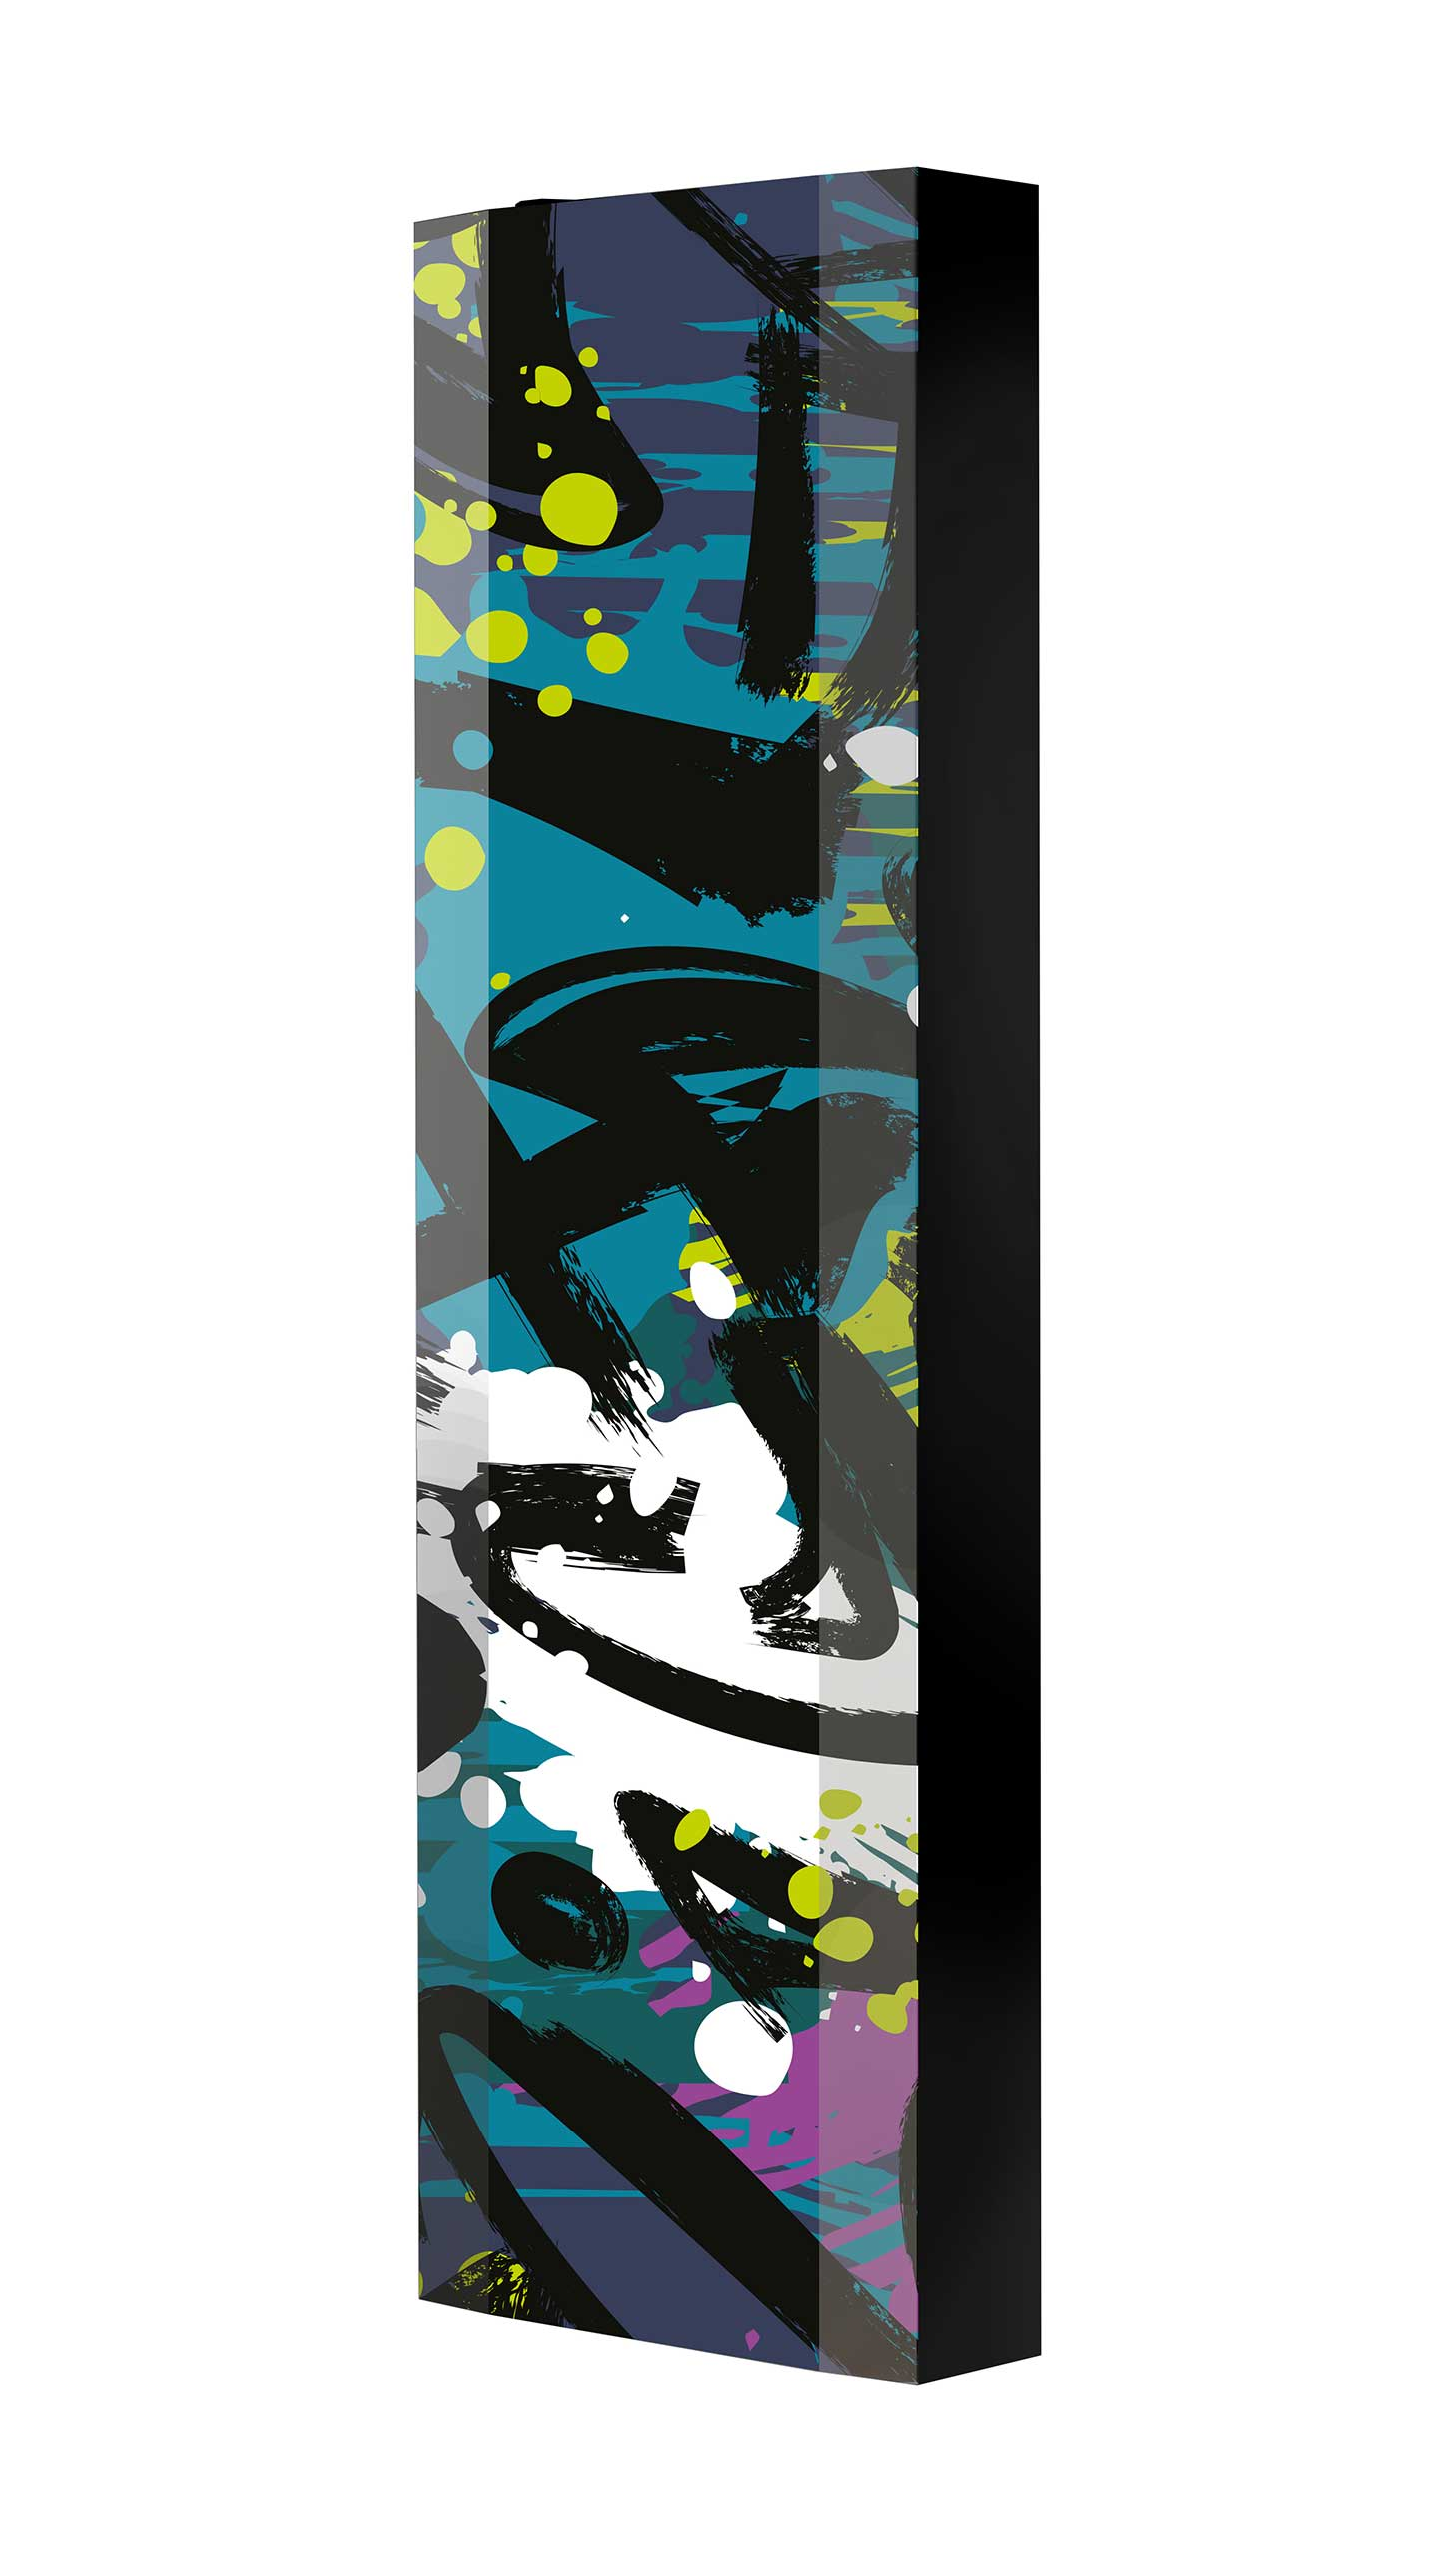 Schuhschrank FLASH 450 BLACK-EDITION Motivschrank schwarz drehbar M134 Graffiti